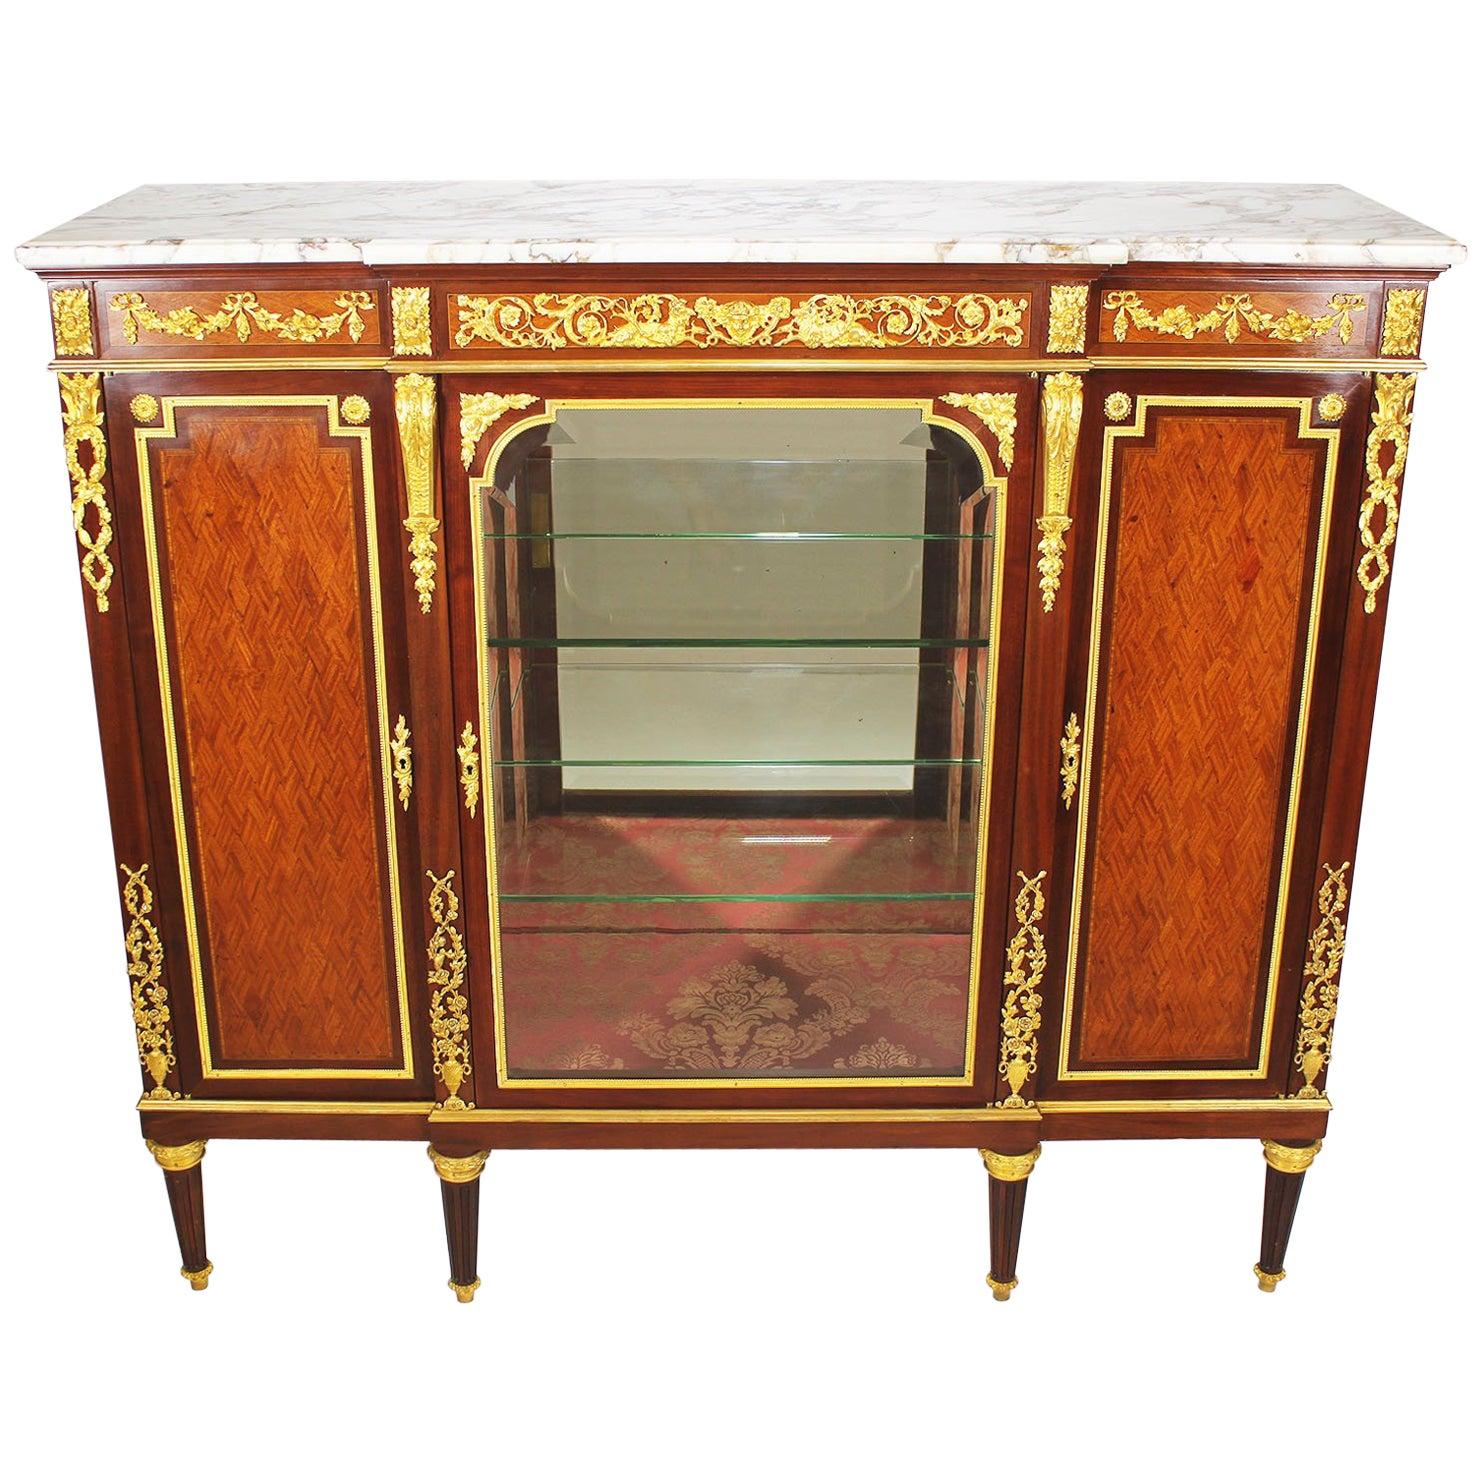 French 19th-20th Century Louis XVI Style Ormolu-Mounted Kingwood Vitrine Cabinet